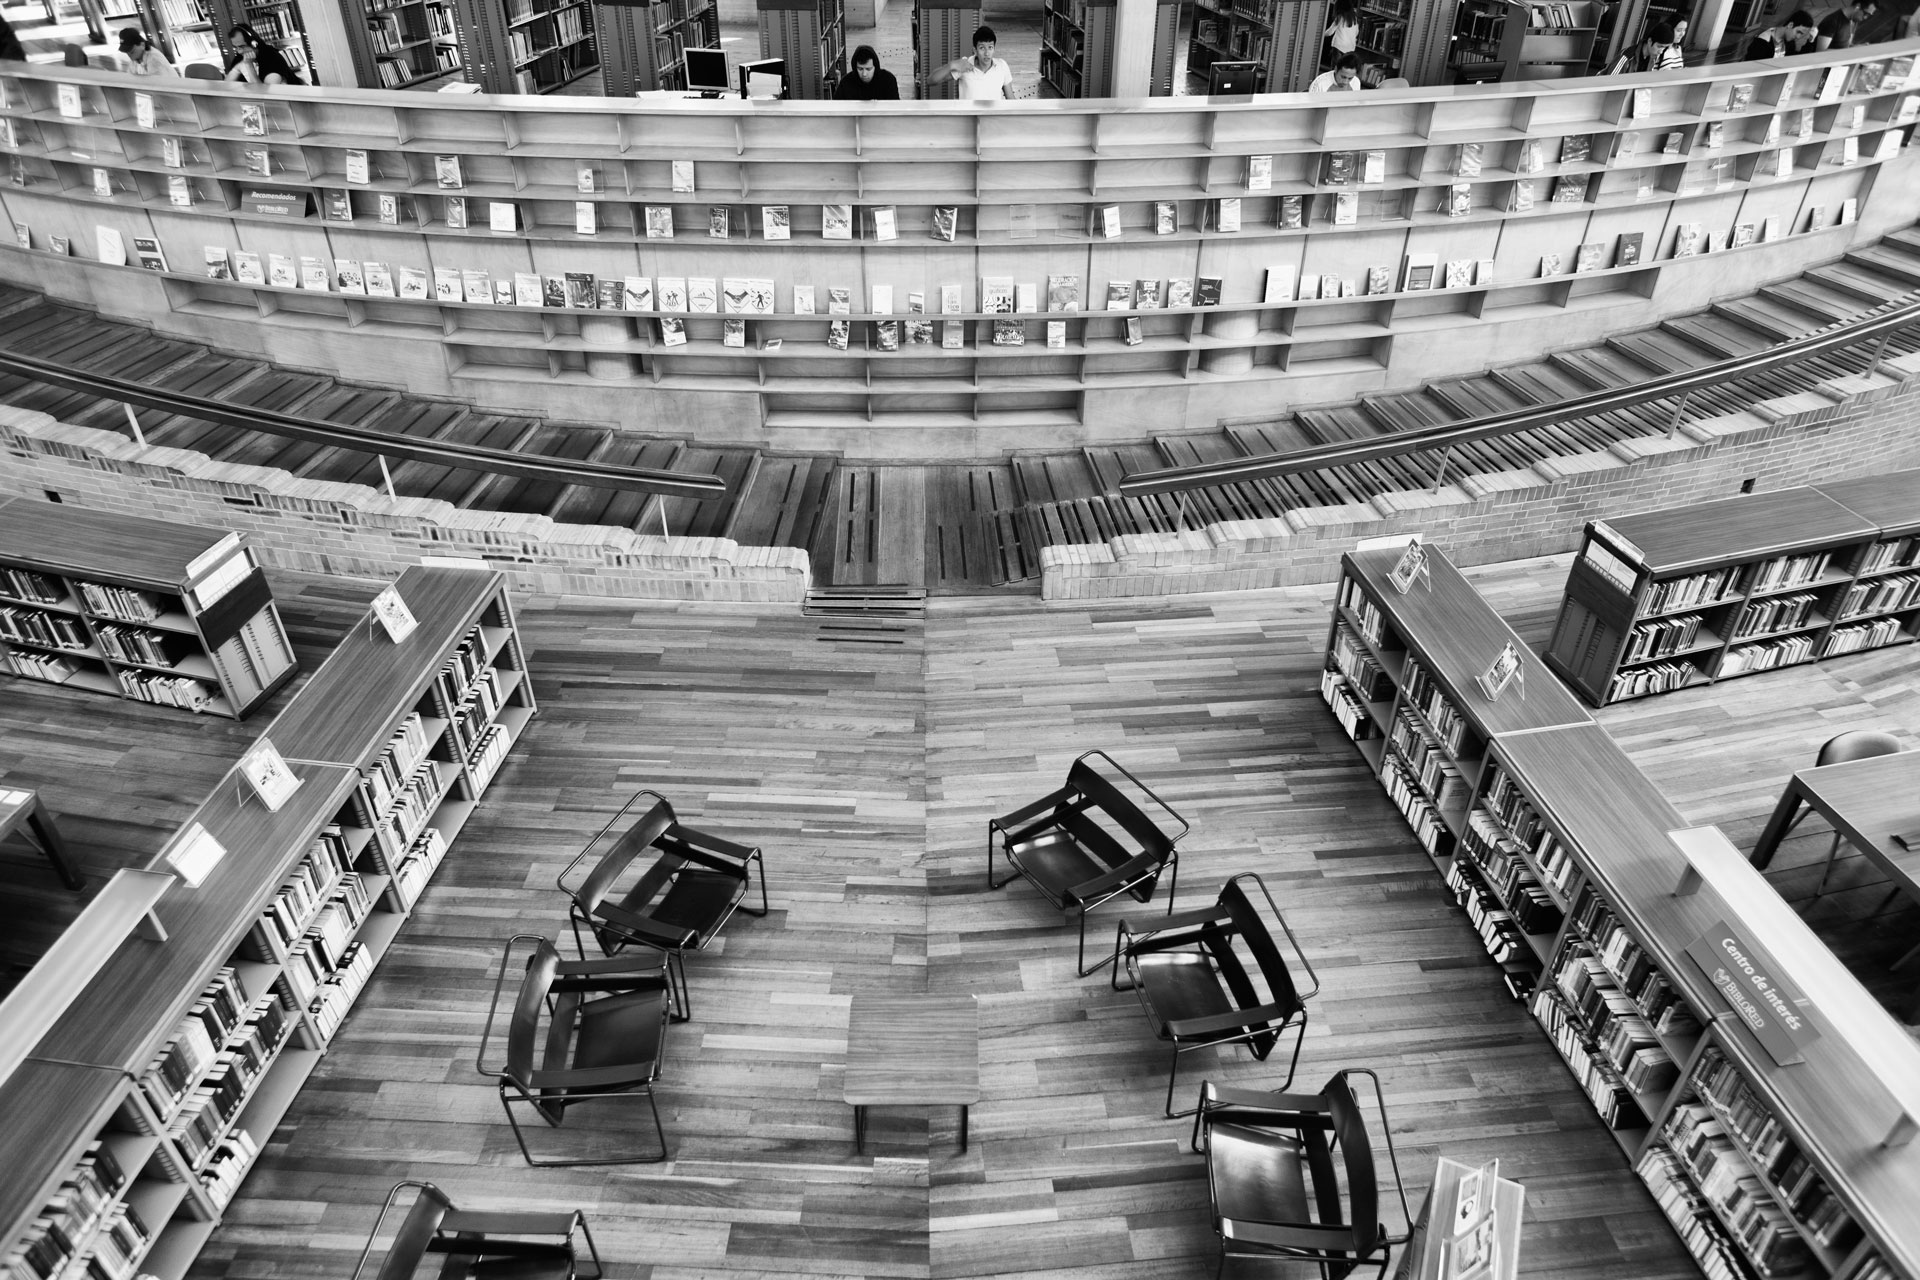 08-simonbosch photography-simon-bosch-architectuur-architecture-bogota-colombia-ArchDaily-Biblioteca Publica Virgilio Barco